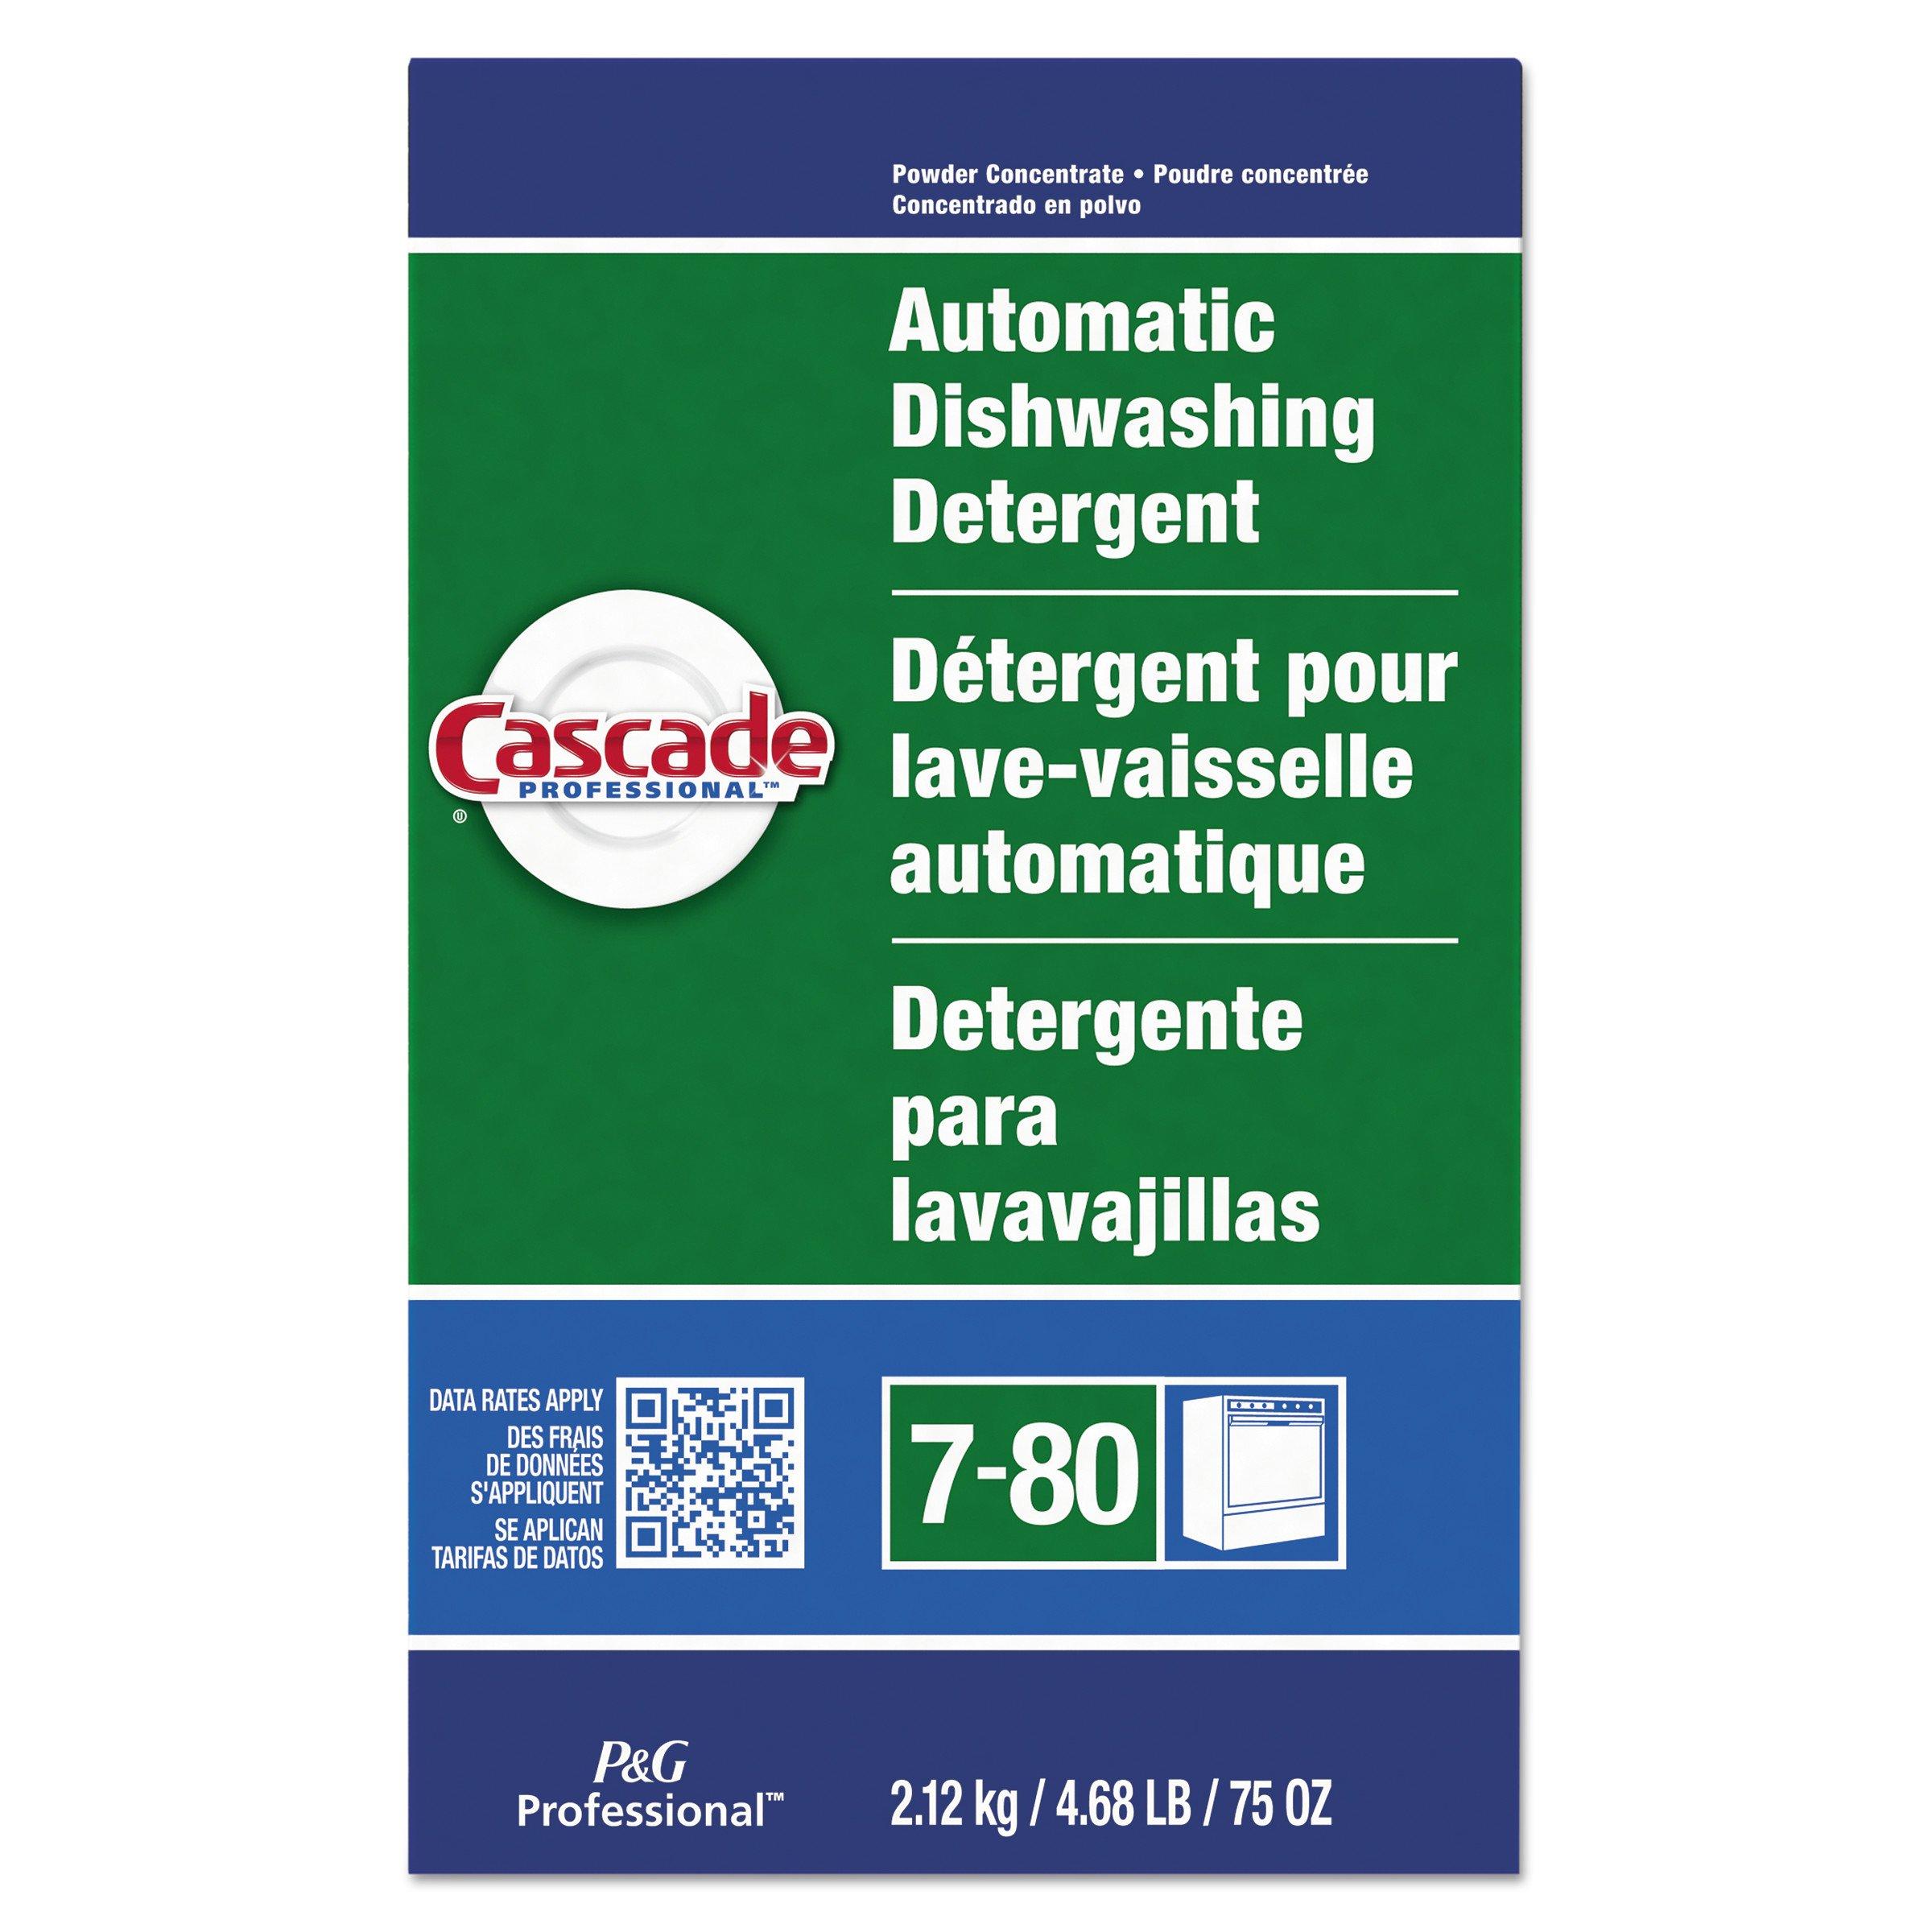 Cascade Professional Automatic Dishwasher Detergent Powder, Fresh Scent, 75 oz. (Case of 7)